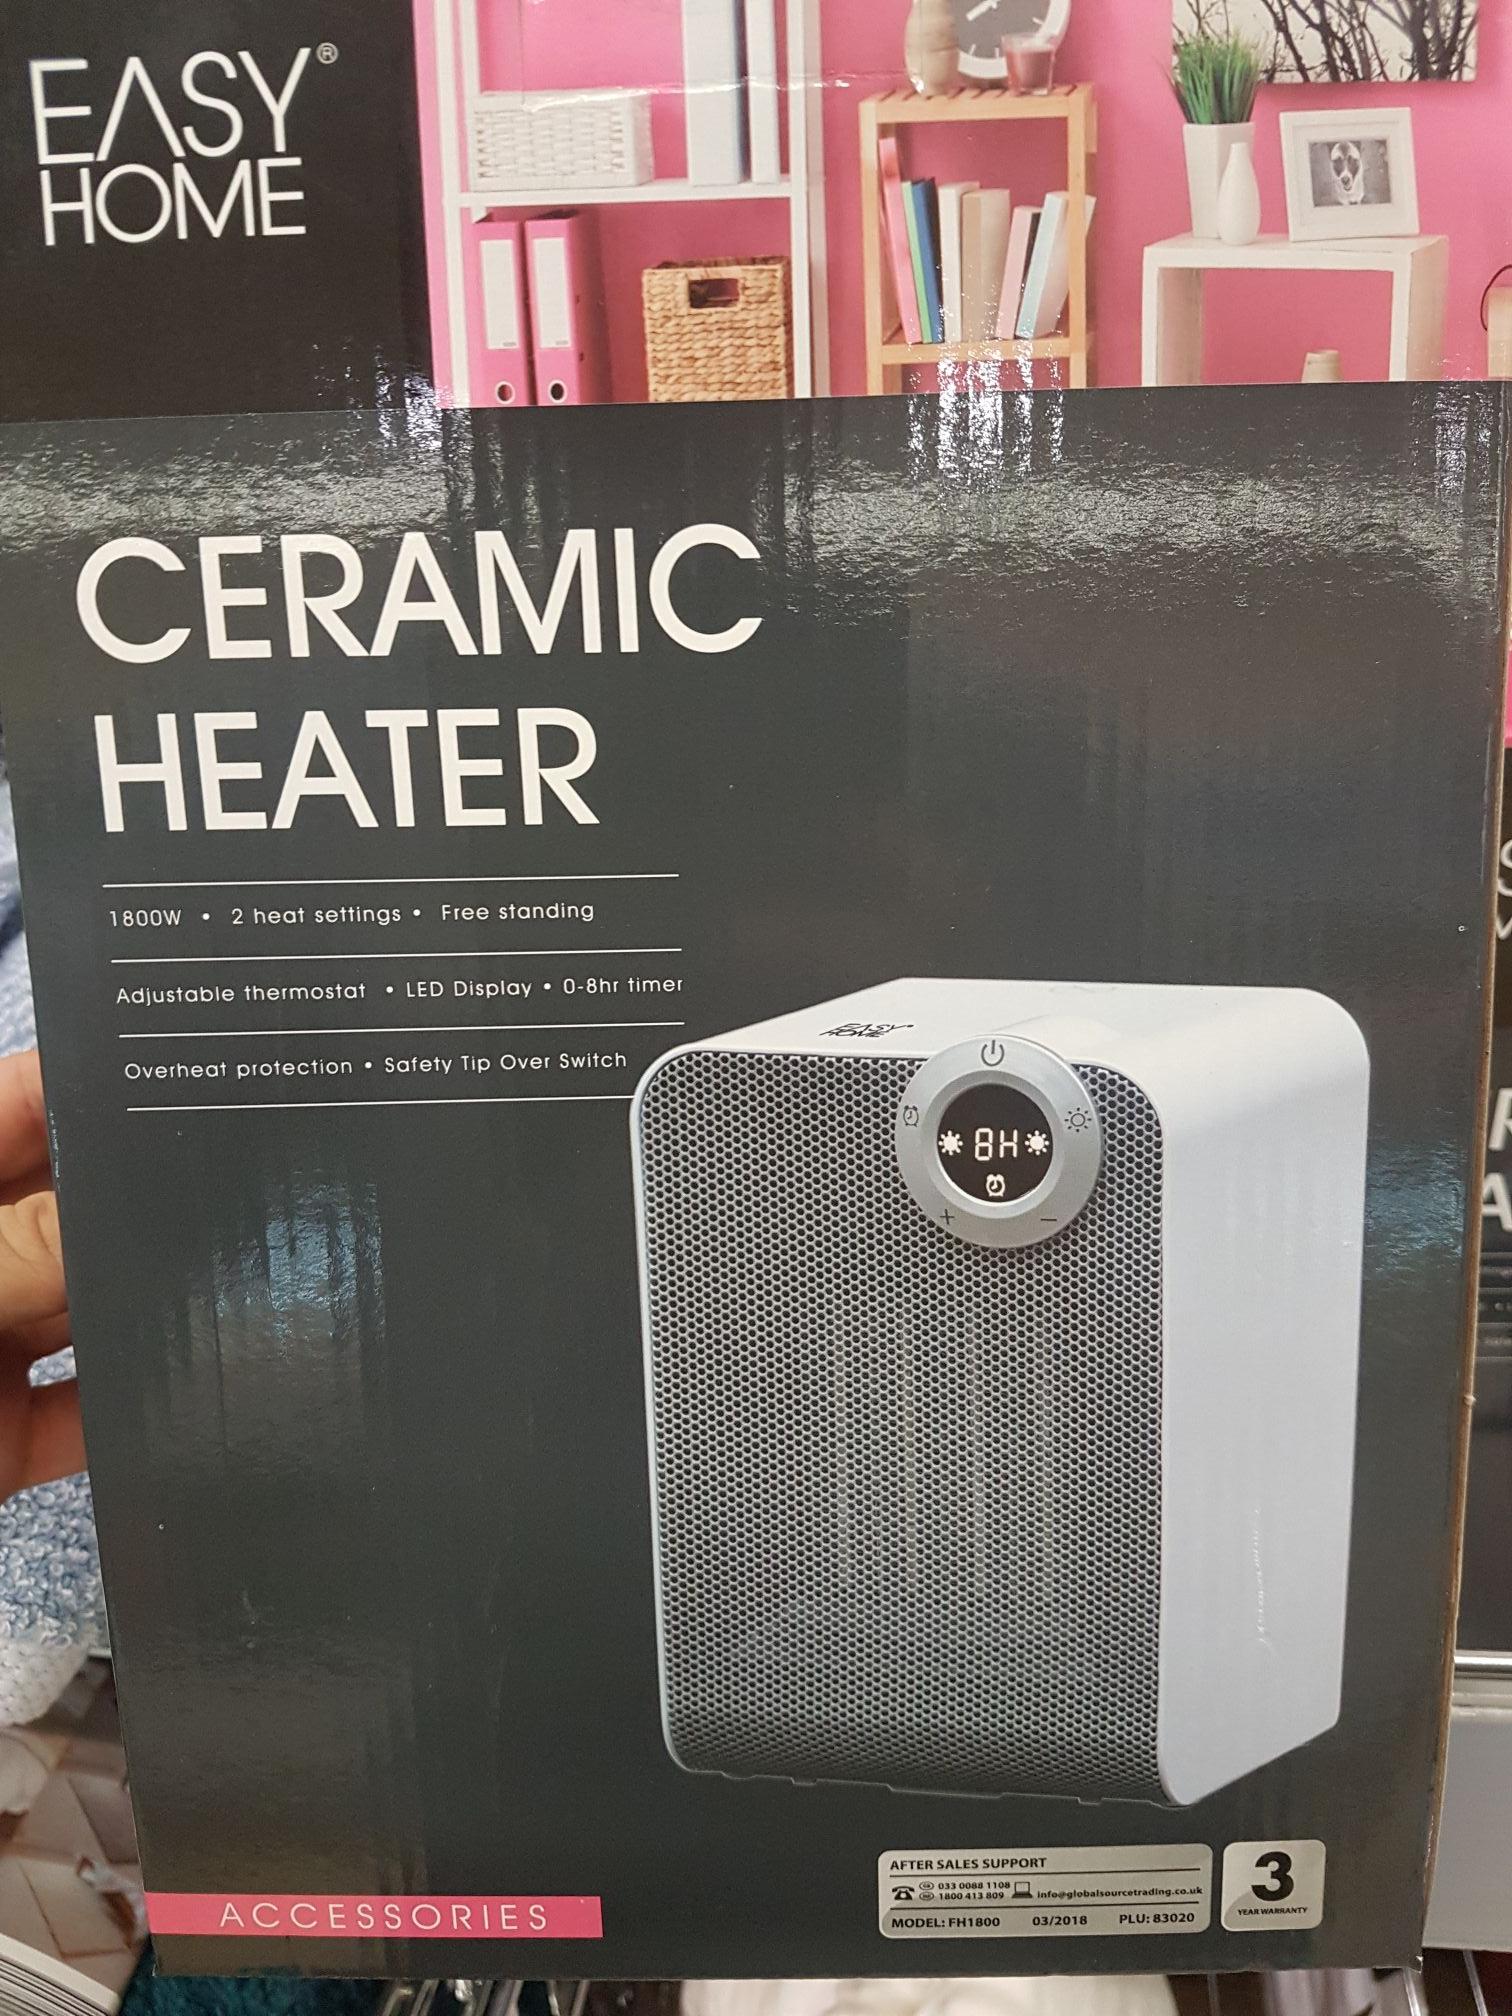 Aldi easyhome Ceramic  Heater reduction £5.99 instore